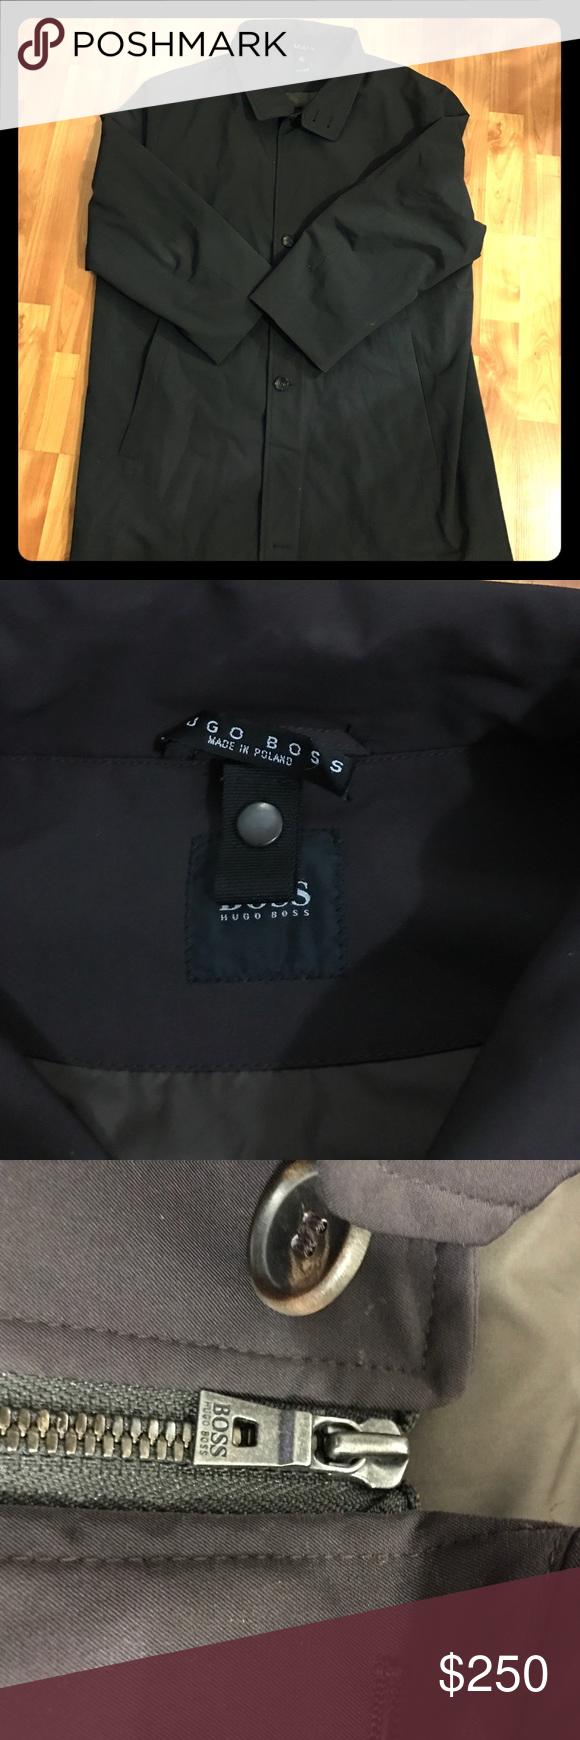 Hugo boss jacket Hugo boss men's jacket dark green. Hugo Boss Jackets & Coats